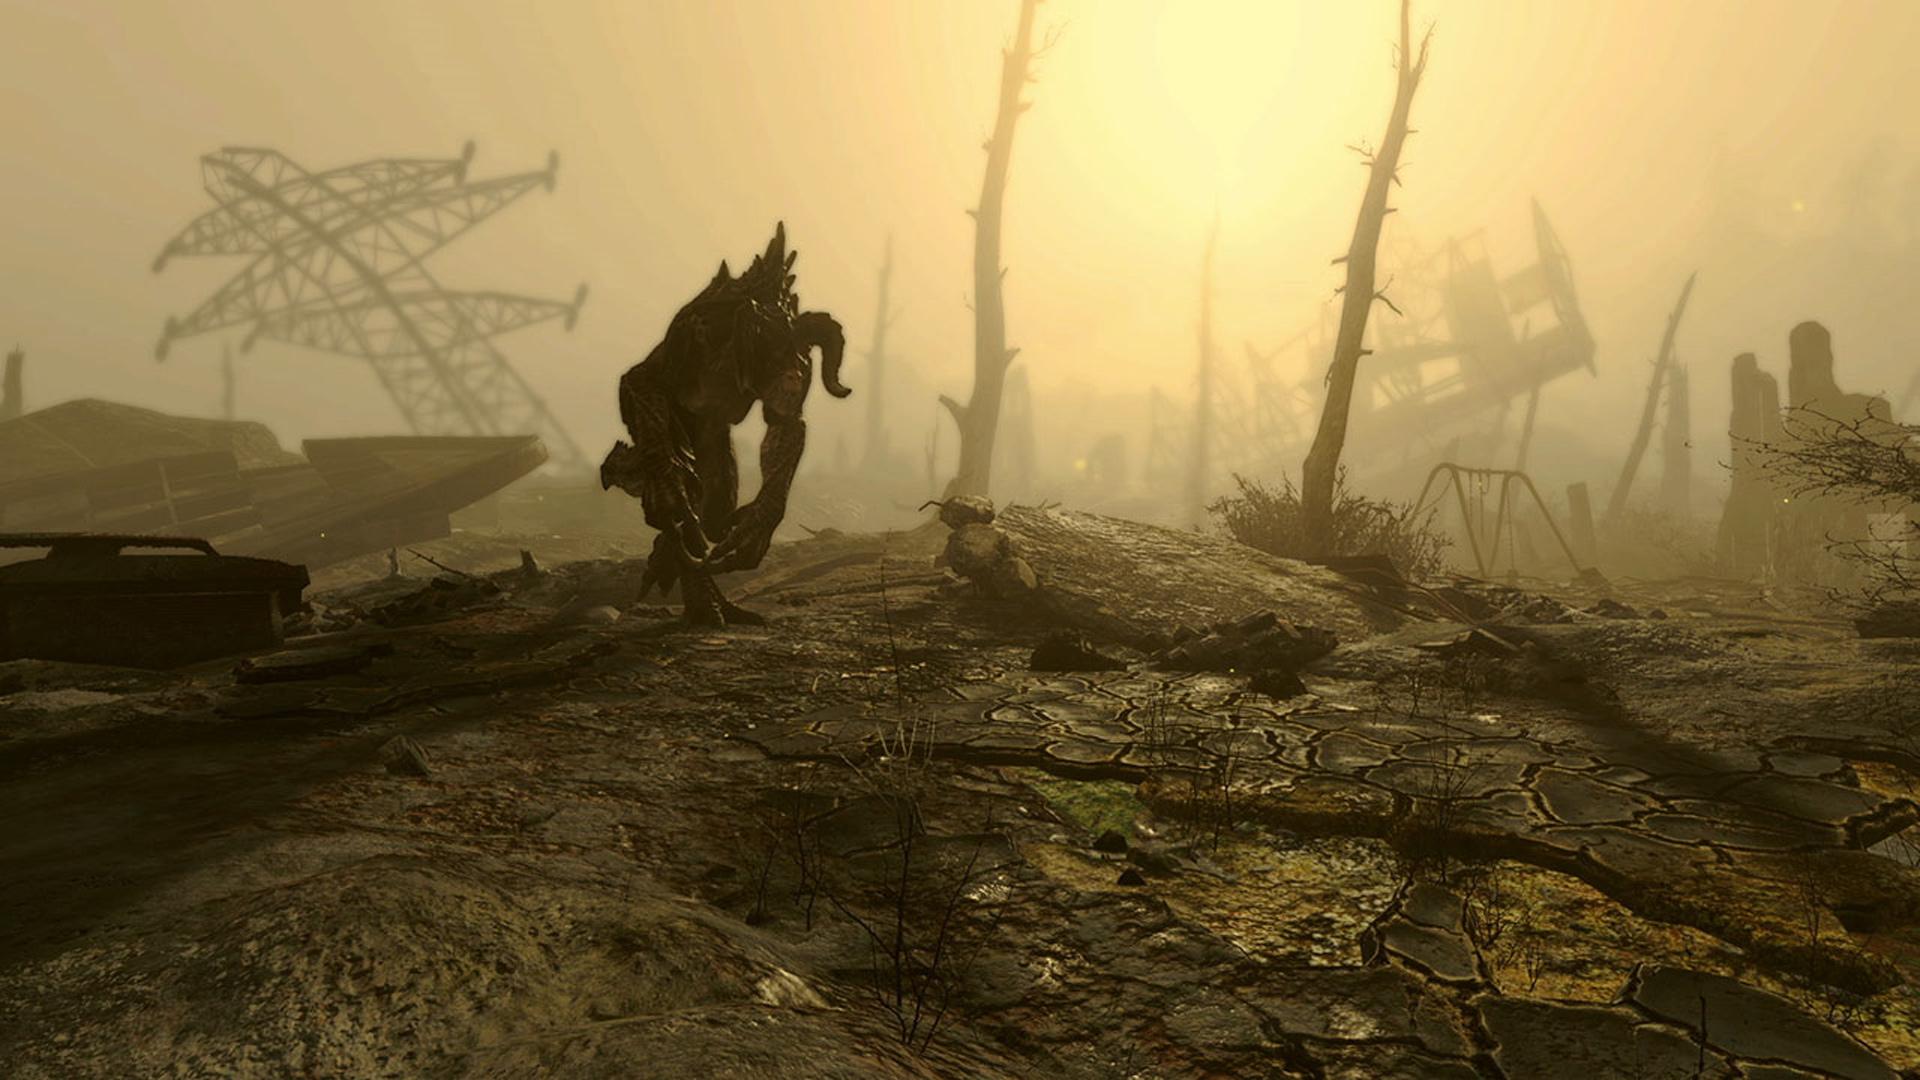 Fallout 4 Xbox Series X FPS Boost vs 60fps Mod Comparison